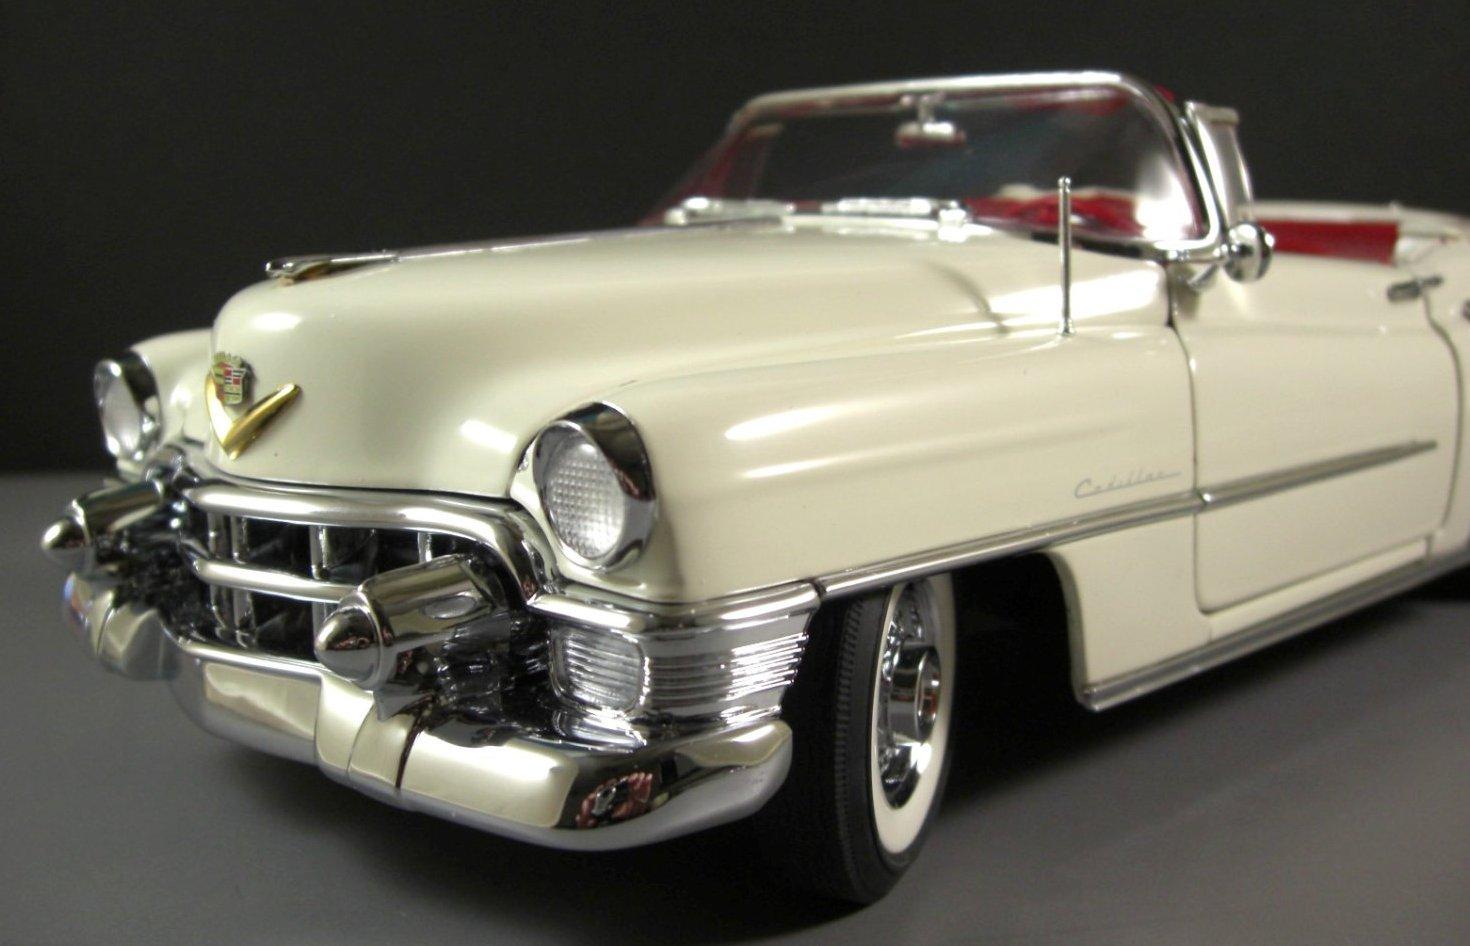 STUNNING 1953 Cadillac Eldorado Convertible Model Car Danbury Mint